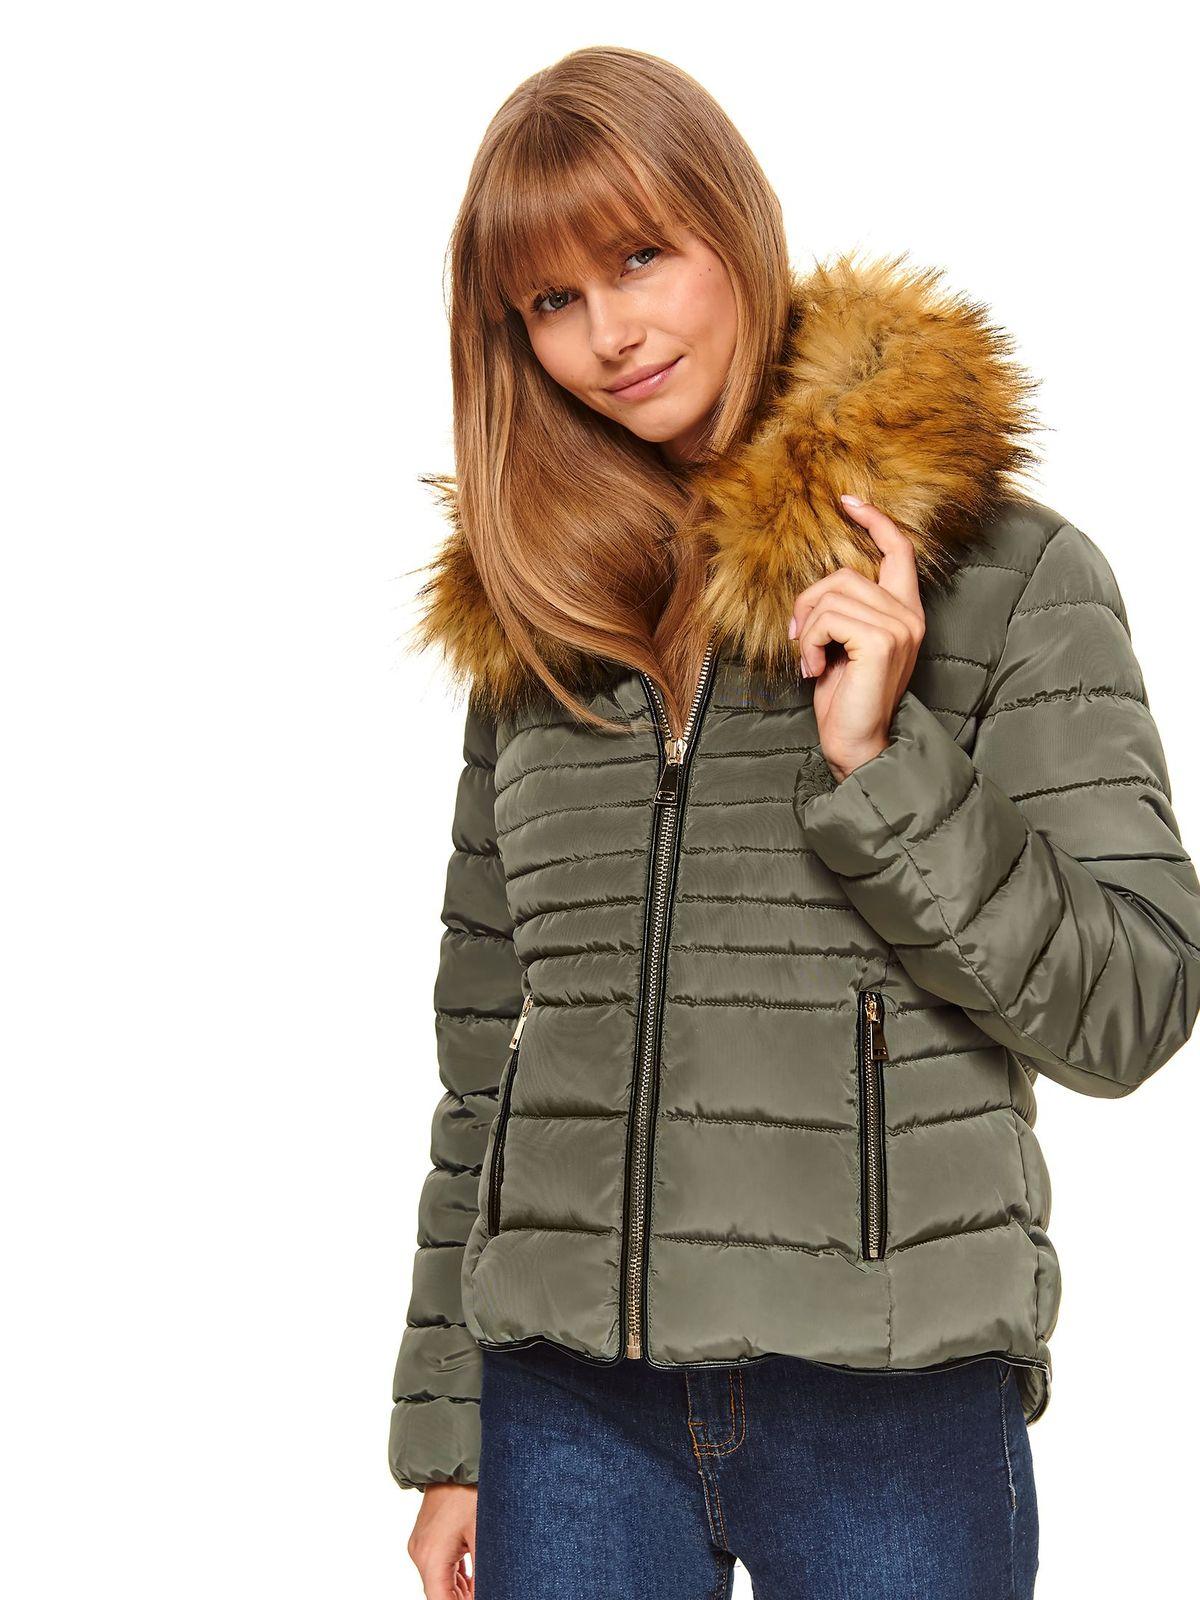 Green jacket casual short cut from slicker the jacket has hood and pockets